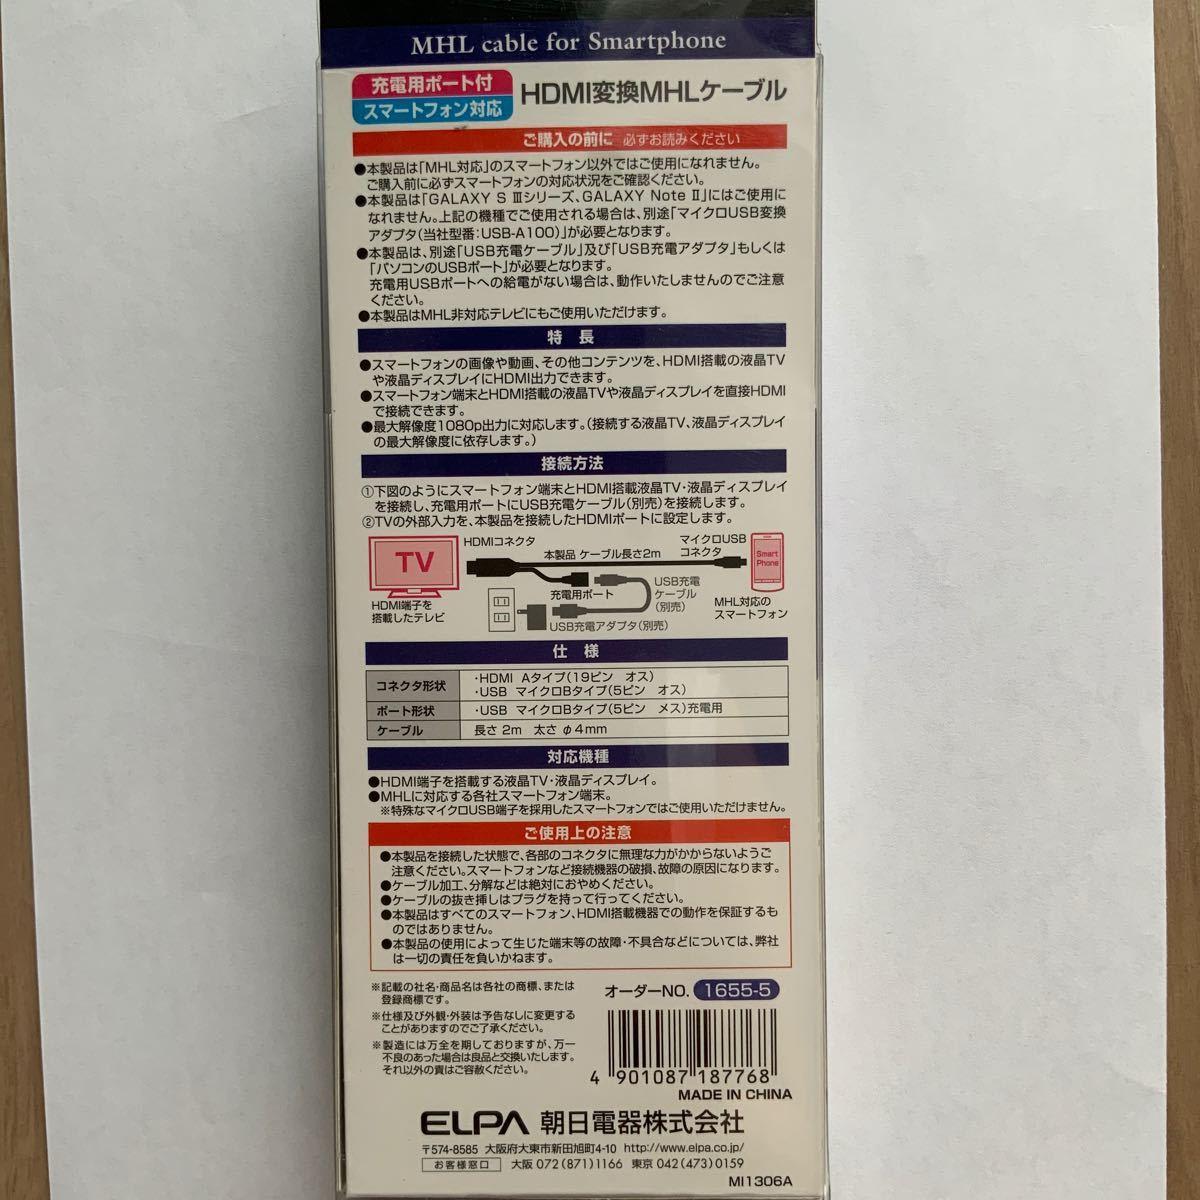 HDMI変換MHLケーブル ELPA (エルパ) MHLホストケーブル USB-MHL200P